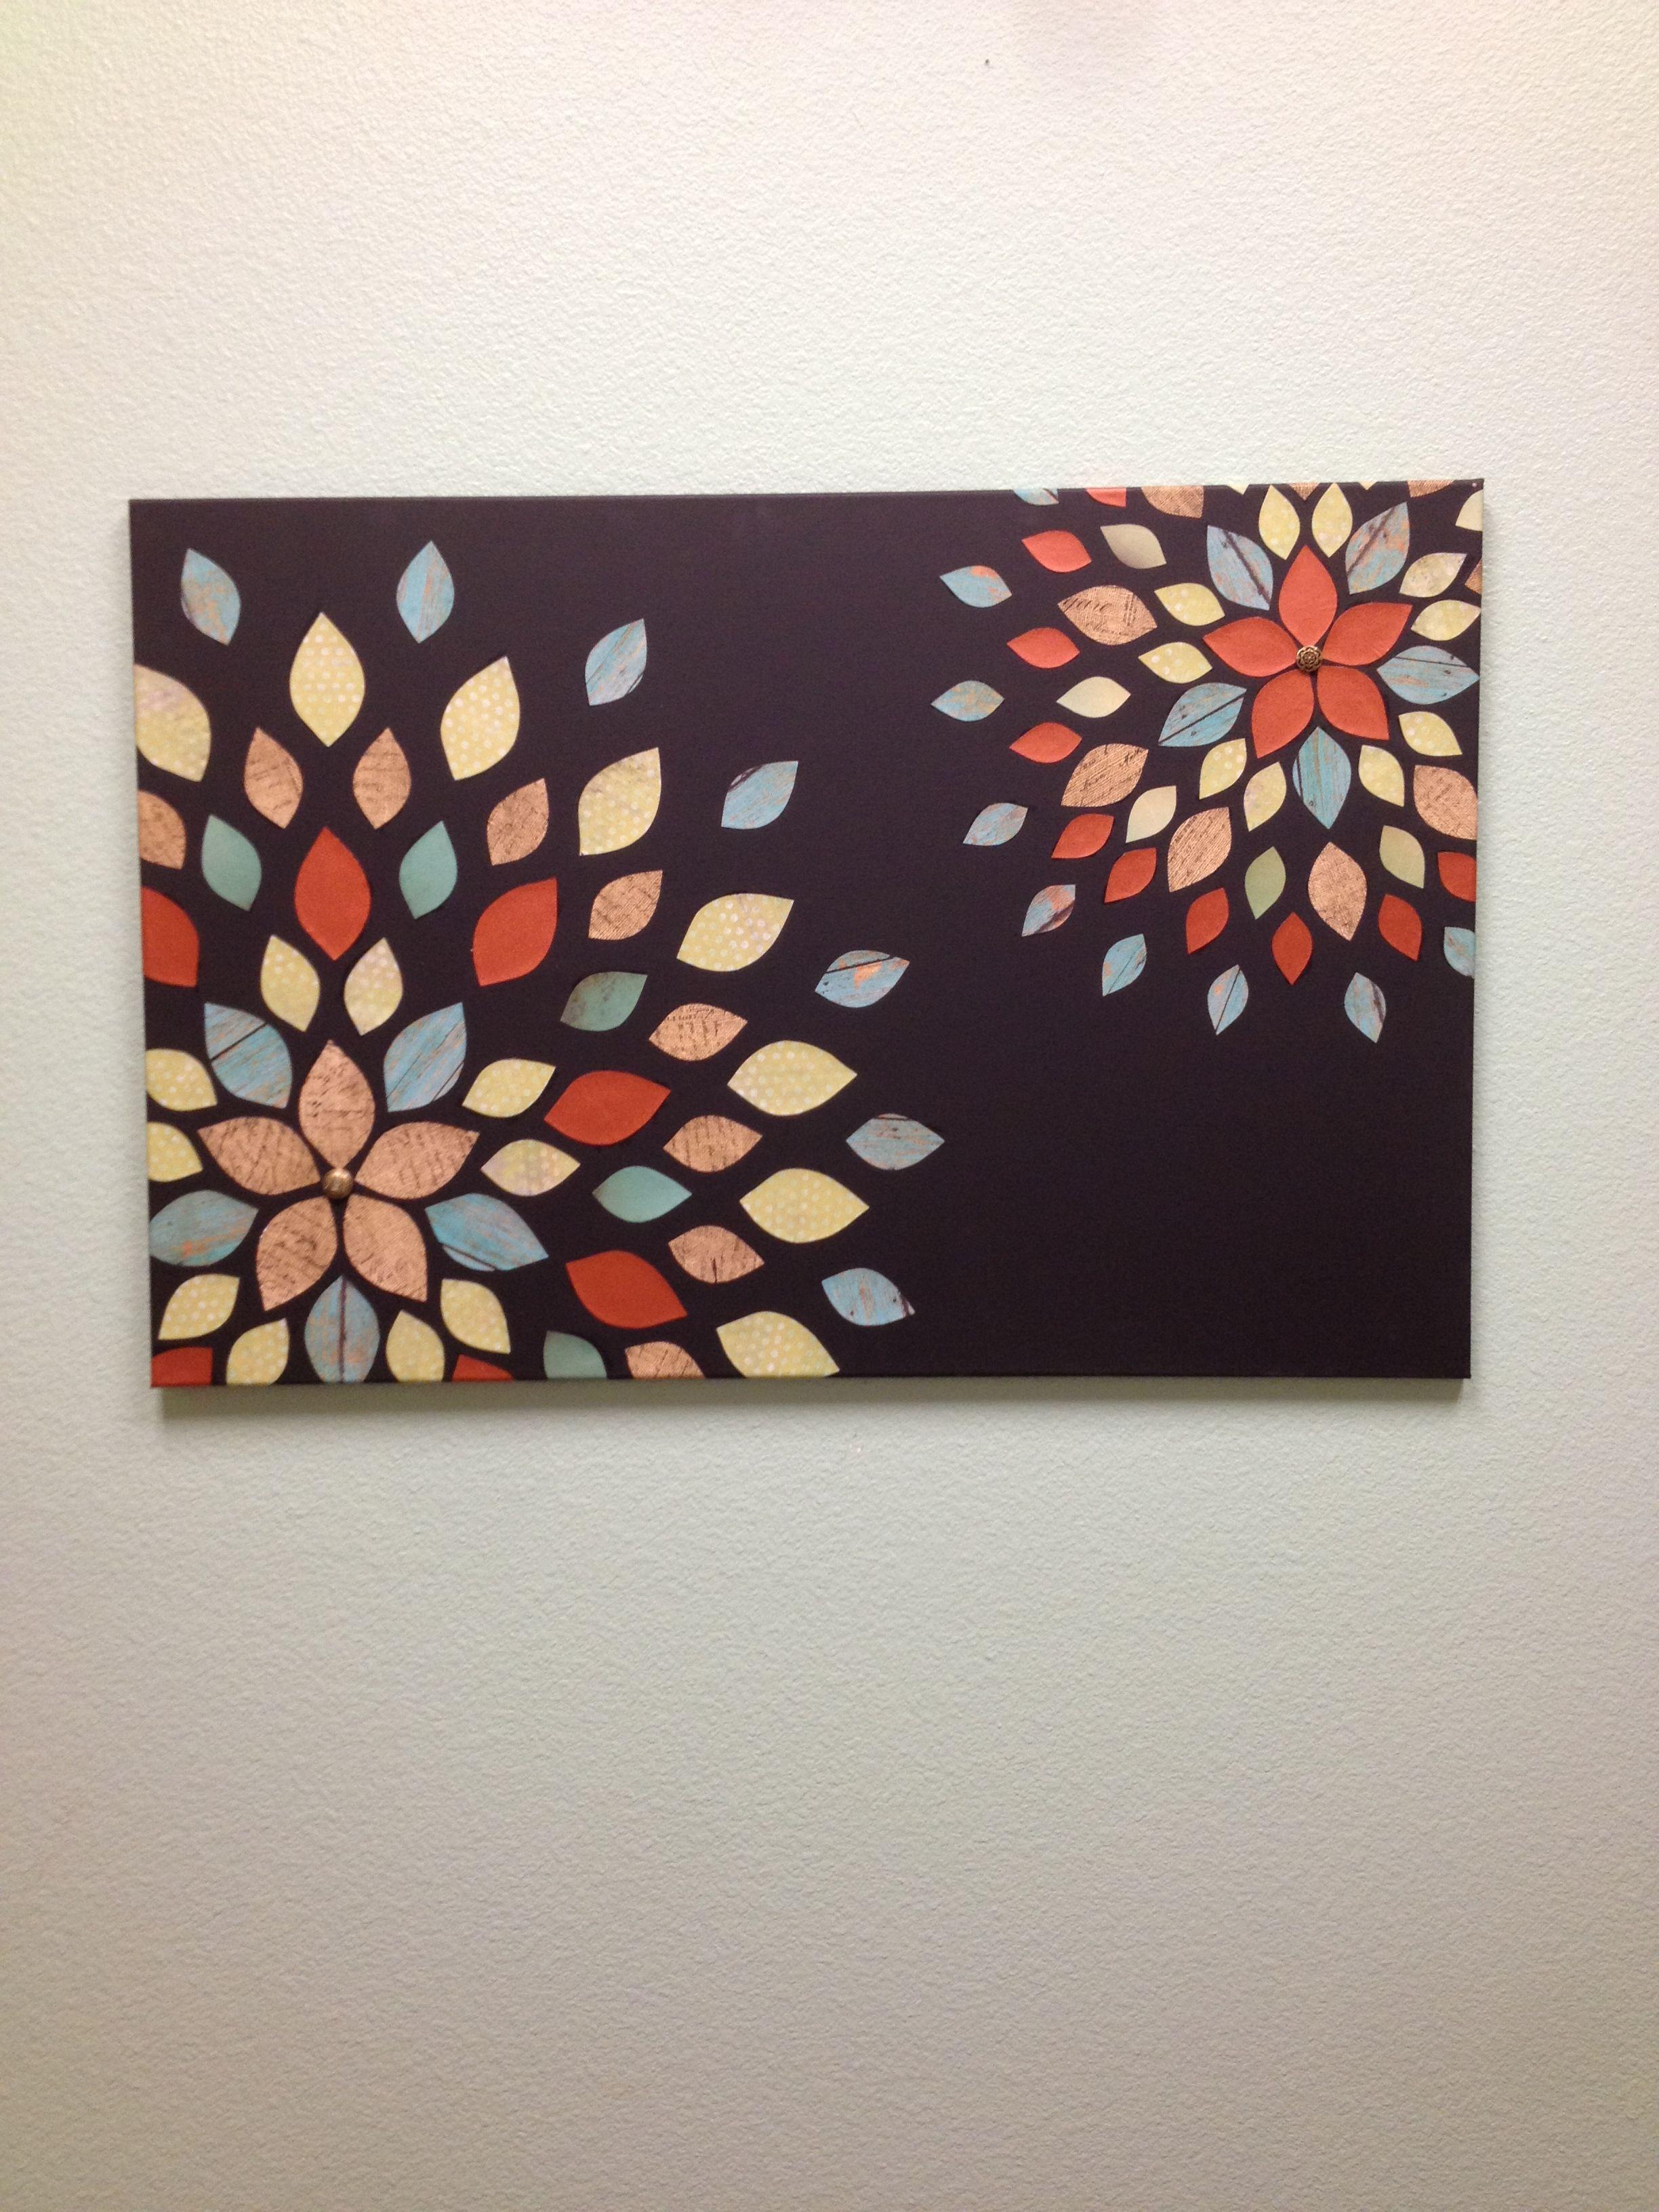 Scrapbook paper on canvas | DIY / Ideas | Pinterest | Scrapbook ...